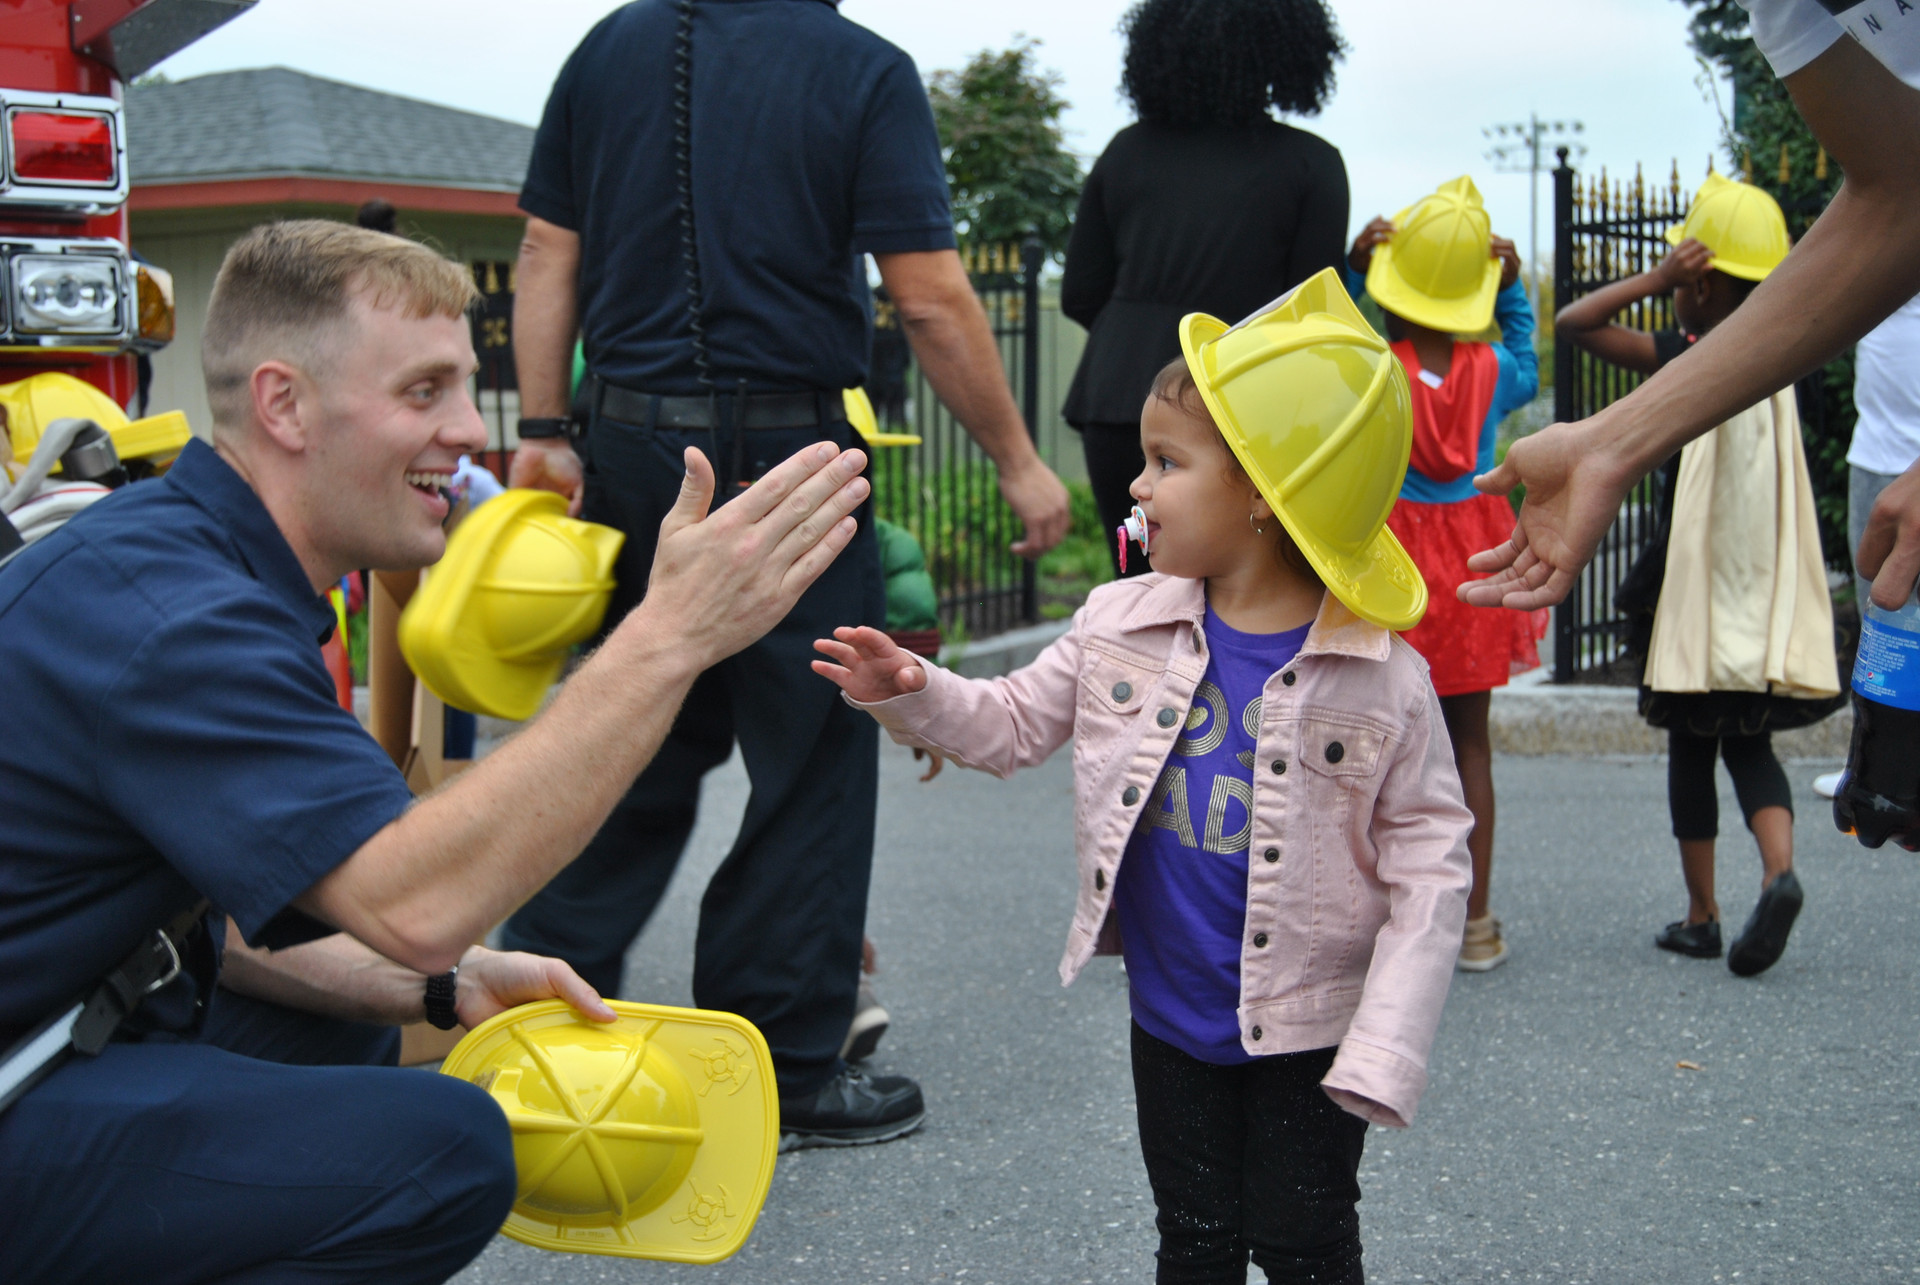 Firefighter and kids (1).JPG